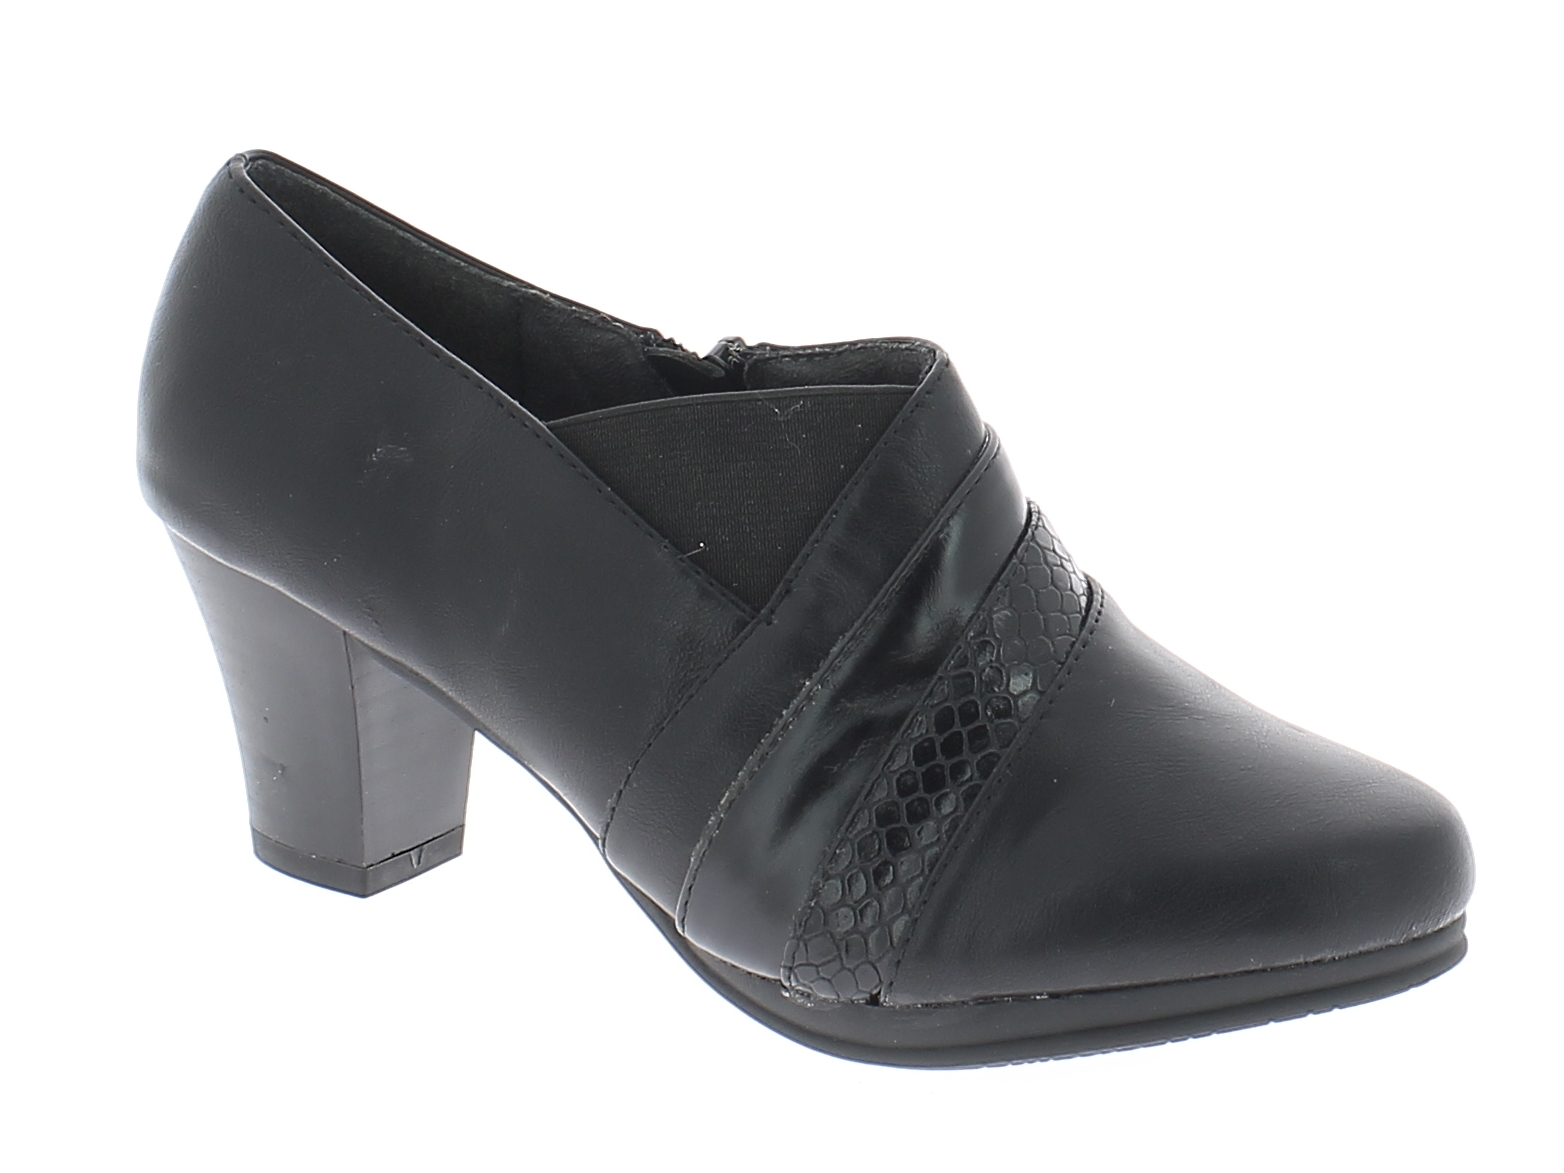 IQSHOES Γυναικεία Γόβα 0353 Μαύρο - IqShoes - 035-3 BLACK black 39/1/15/25 παπούτσια  γόβες